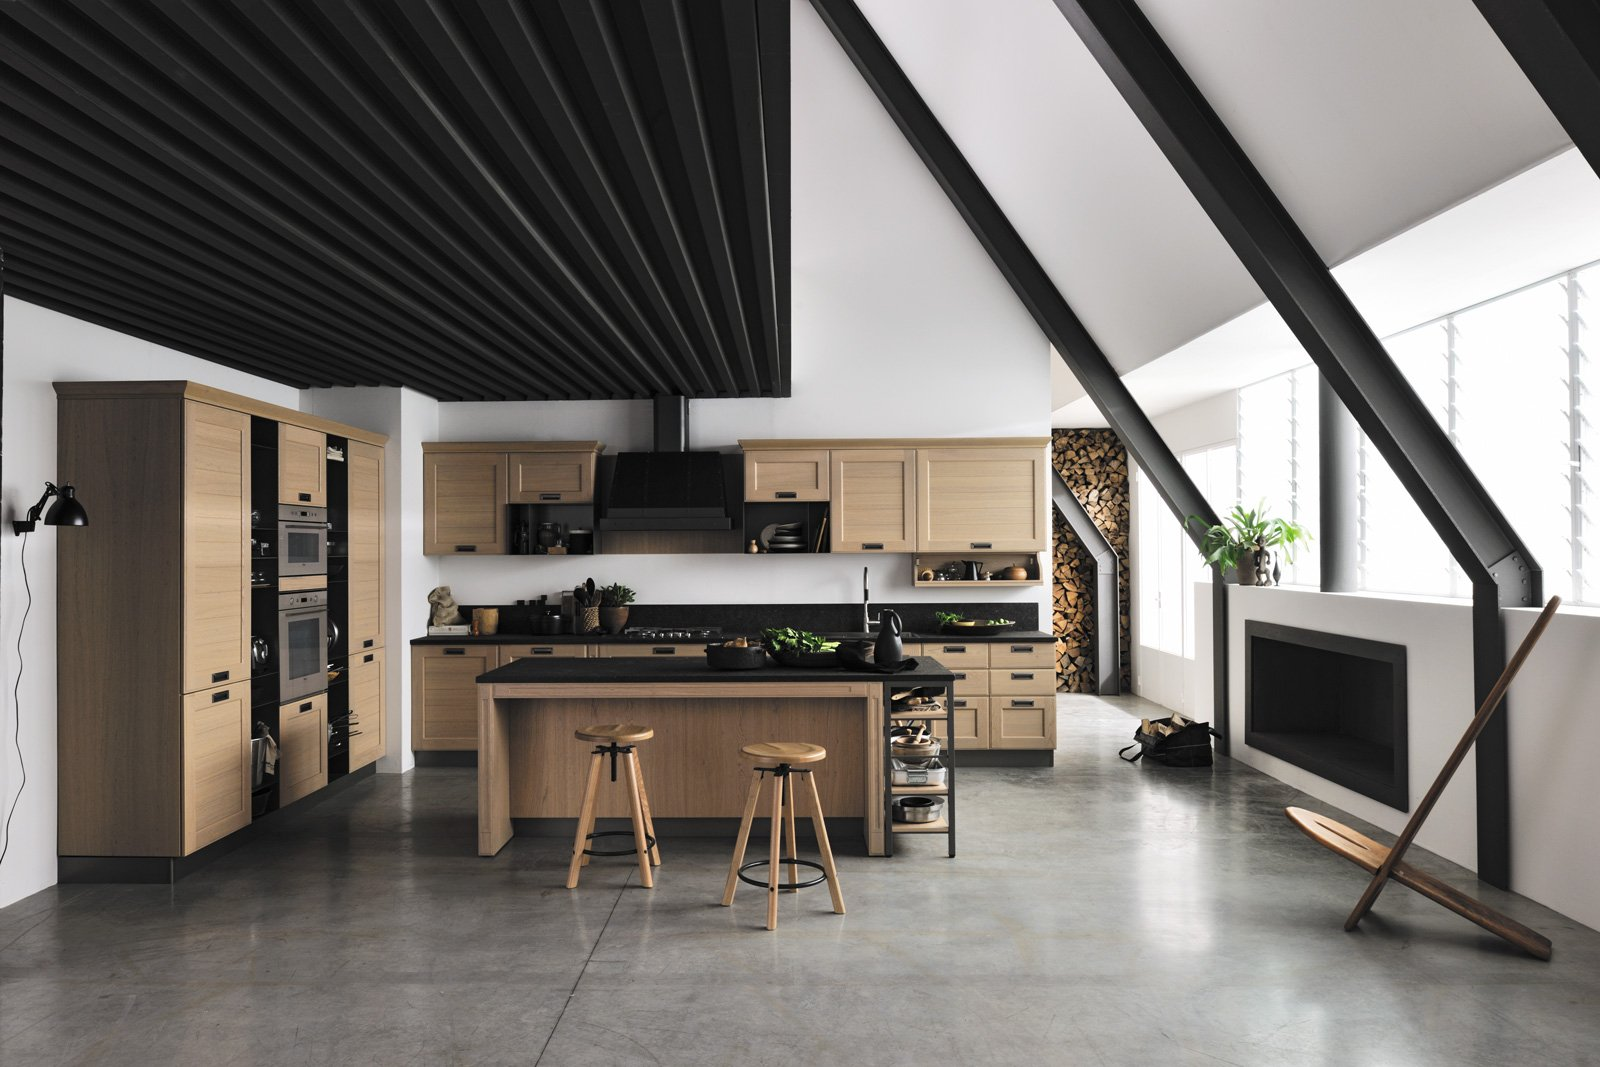 Cucine in legno tradizionali country o moderne cose di for Cucine moderne